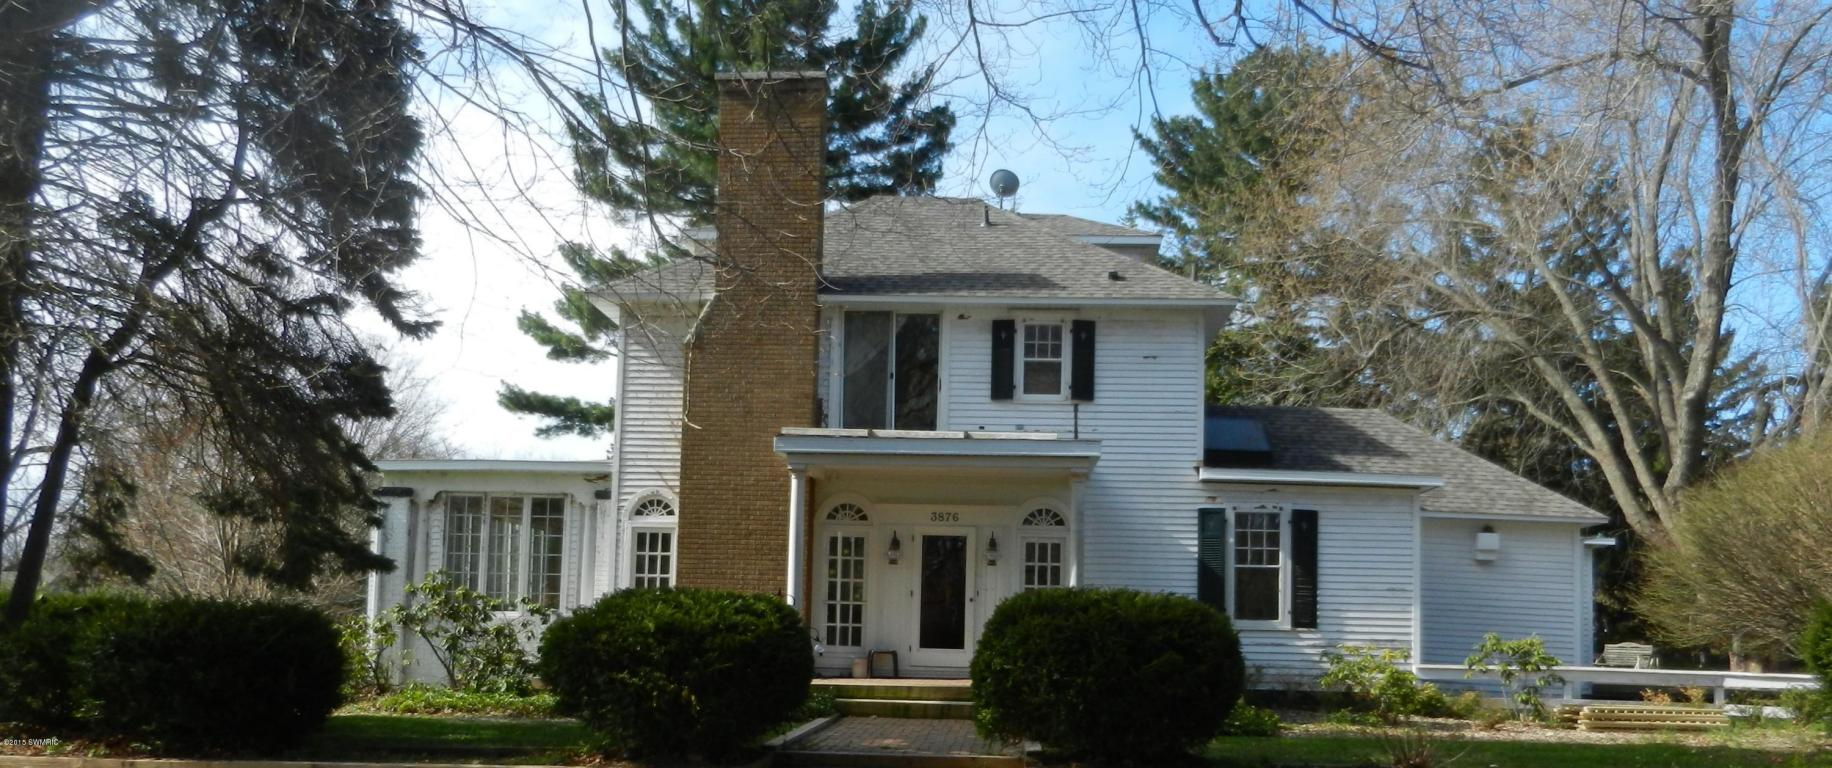 Real Estate for Sale, ListingId: 33098018, Benton Harbor,MI49022